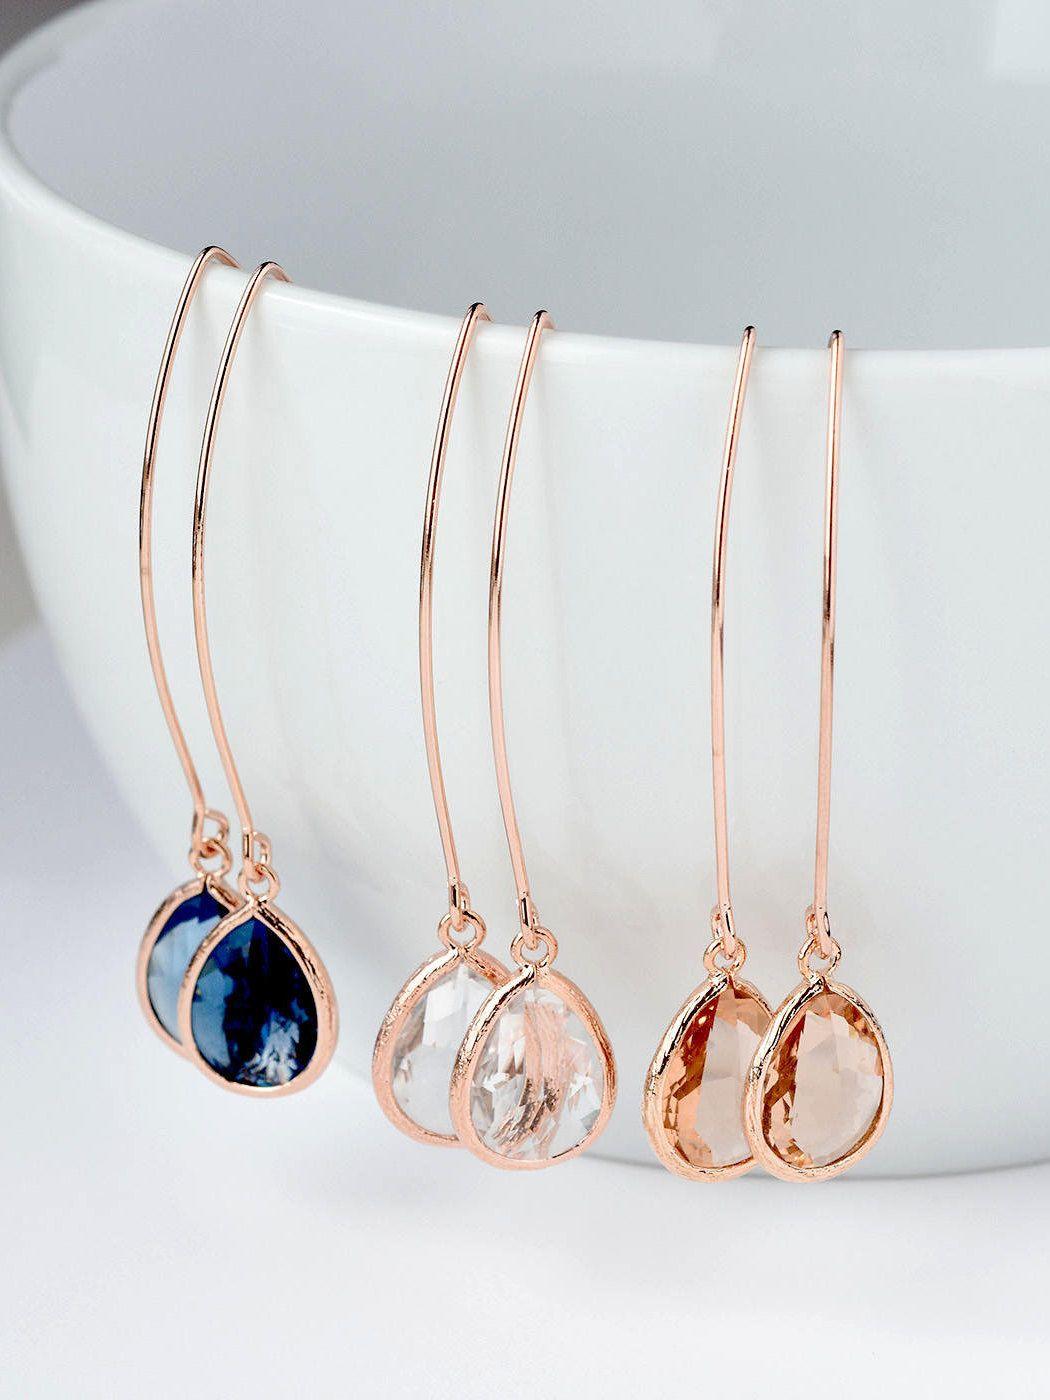 Clear Dangle Earrings April Crystal Quartz Birthday Drop 14K Gold-Filled Hook Gold Framed Glass Gem Elegant Bridesmaids Wedding Gift